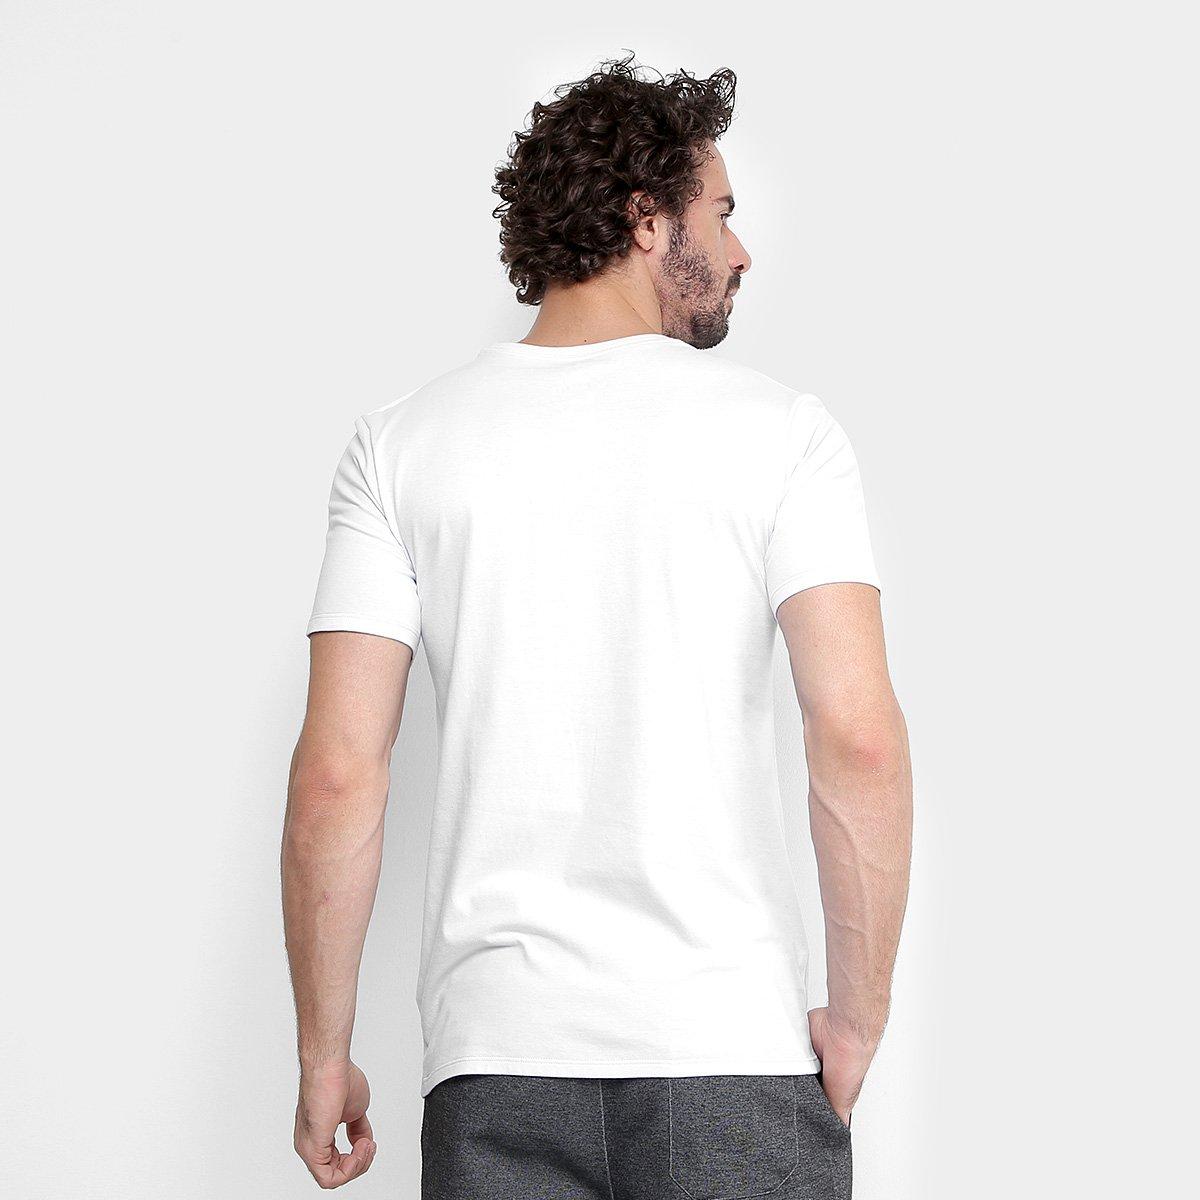 Camiseta Nike New Jdi Swoosh Masculina - Preto e Roxo - Compre Agora ... a232b86f751c6